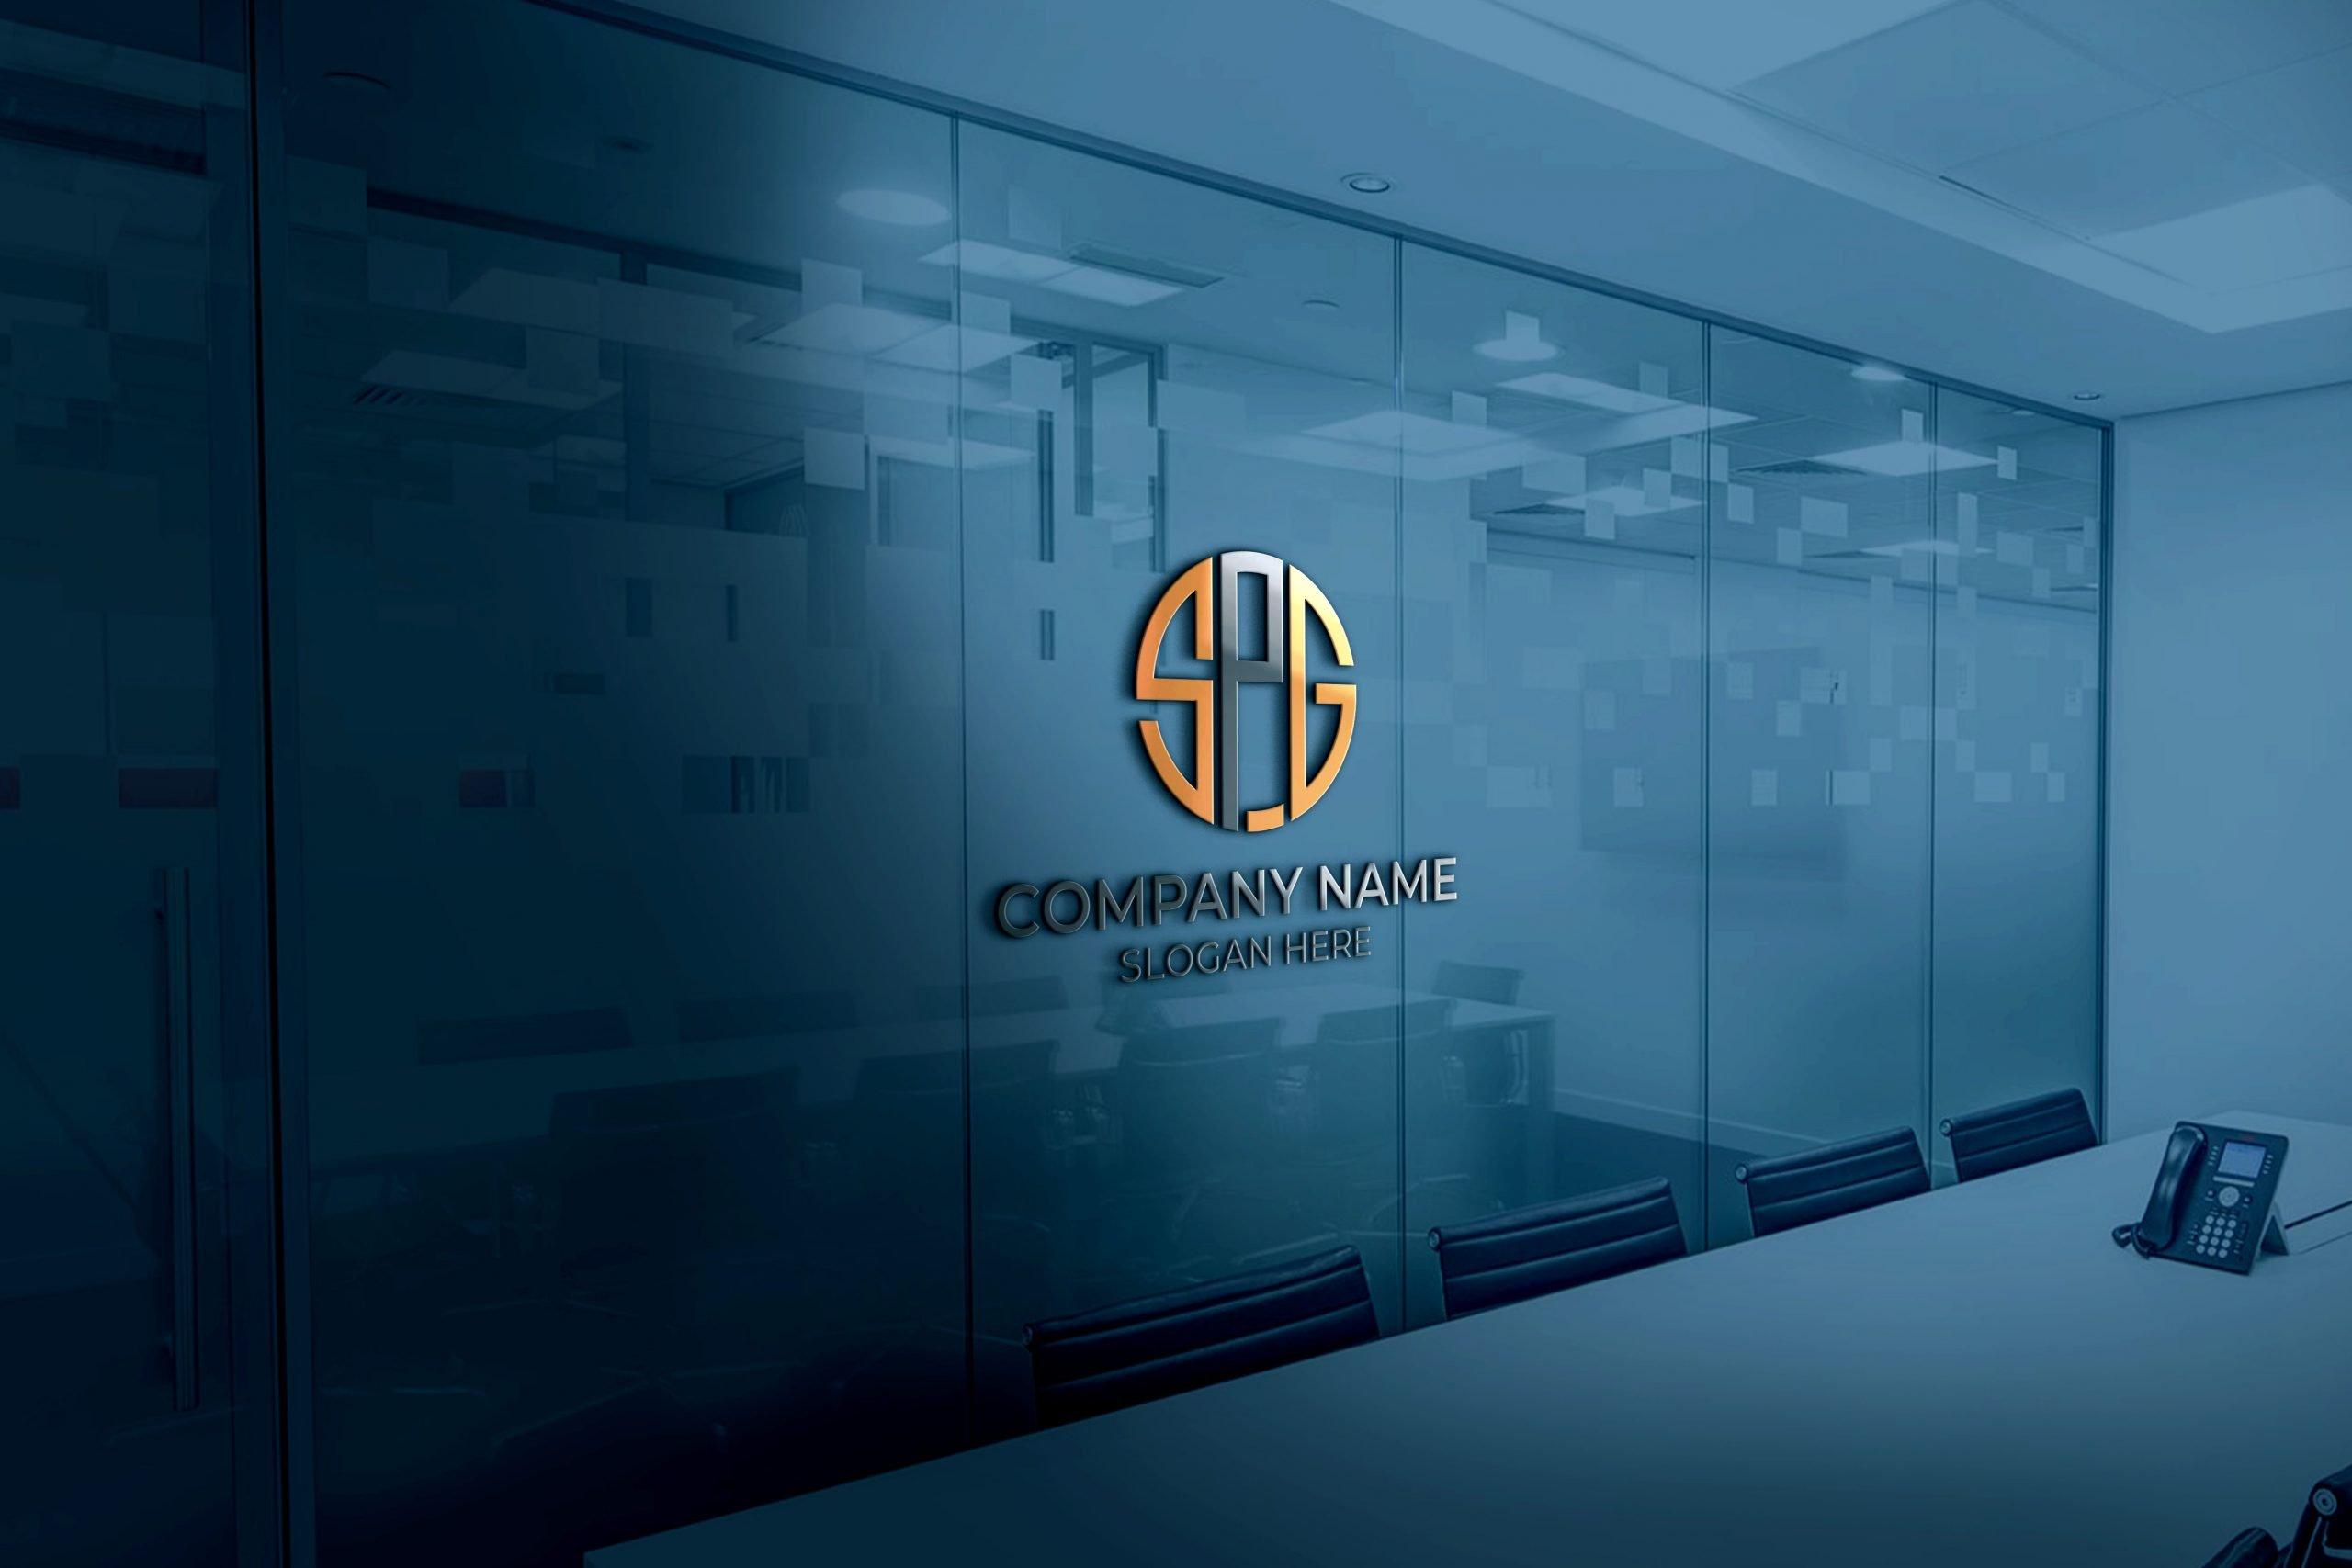 SPG logo on 3d glass window